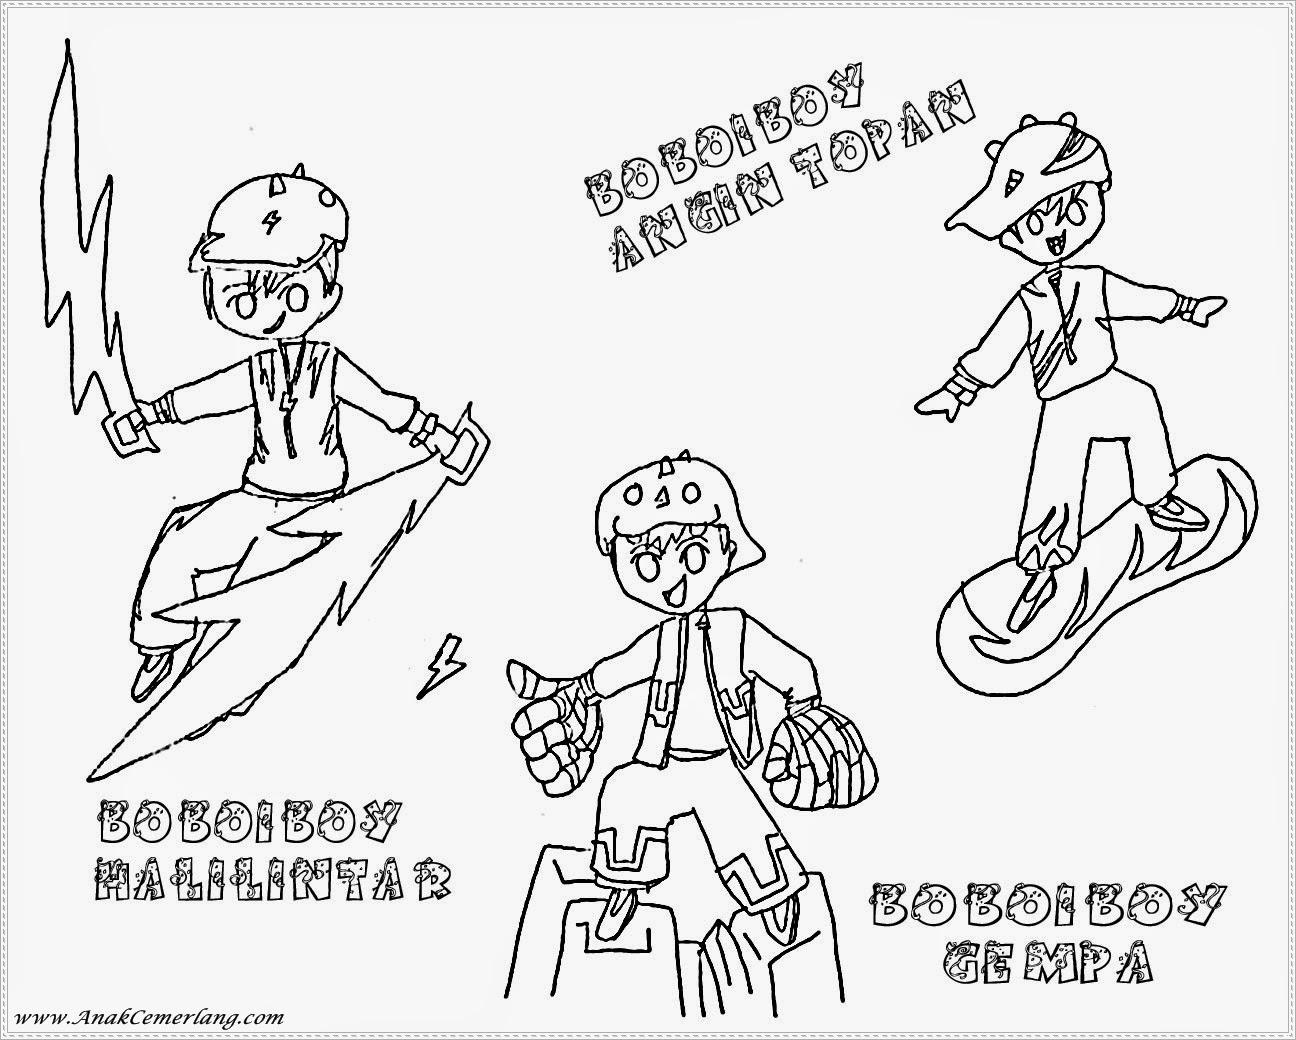 gambar tiga kekuatan boboiboy